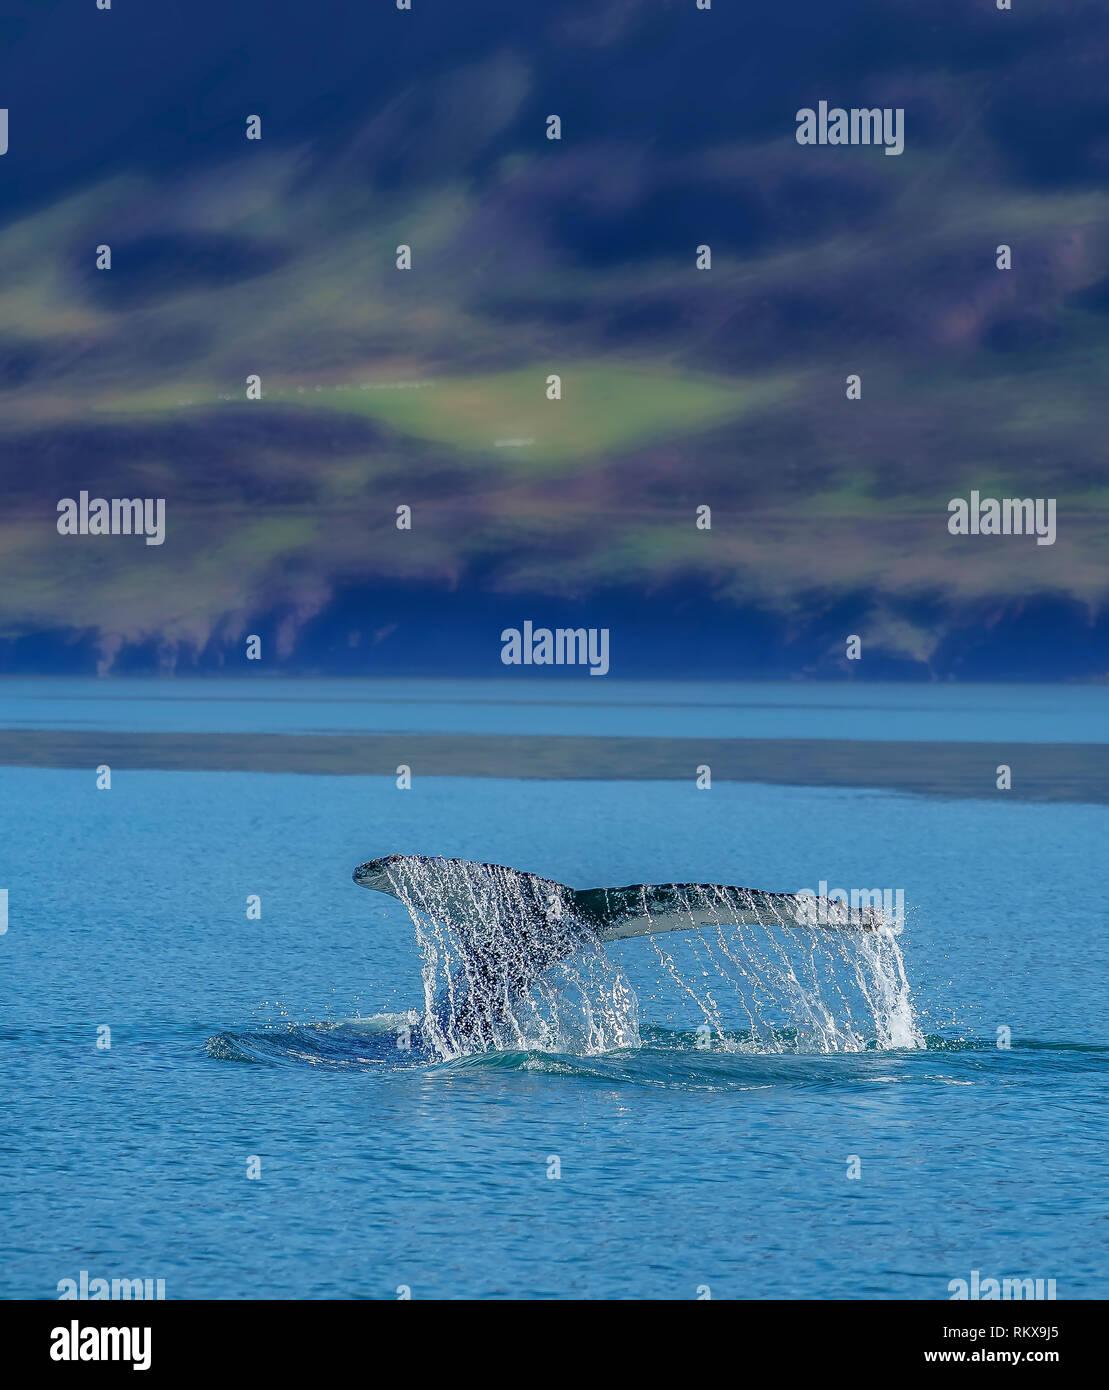 Humpback Whale, Lobtailing, Eyjafjordur, Iceland - Stock Image